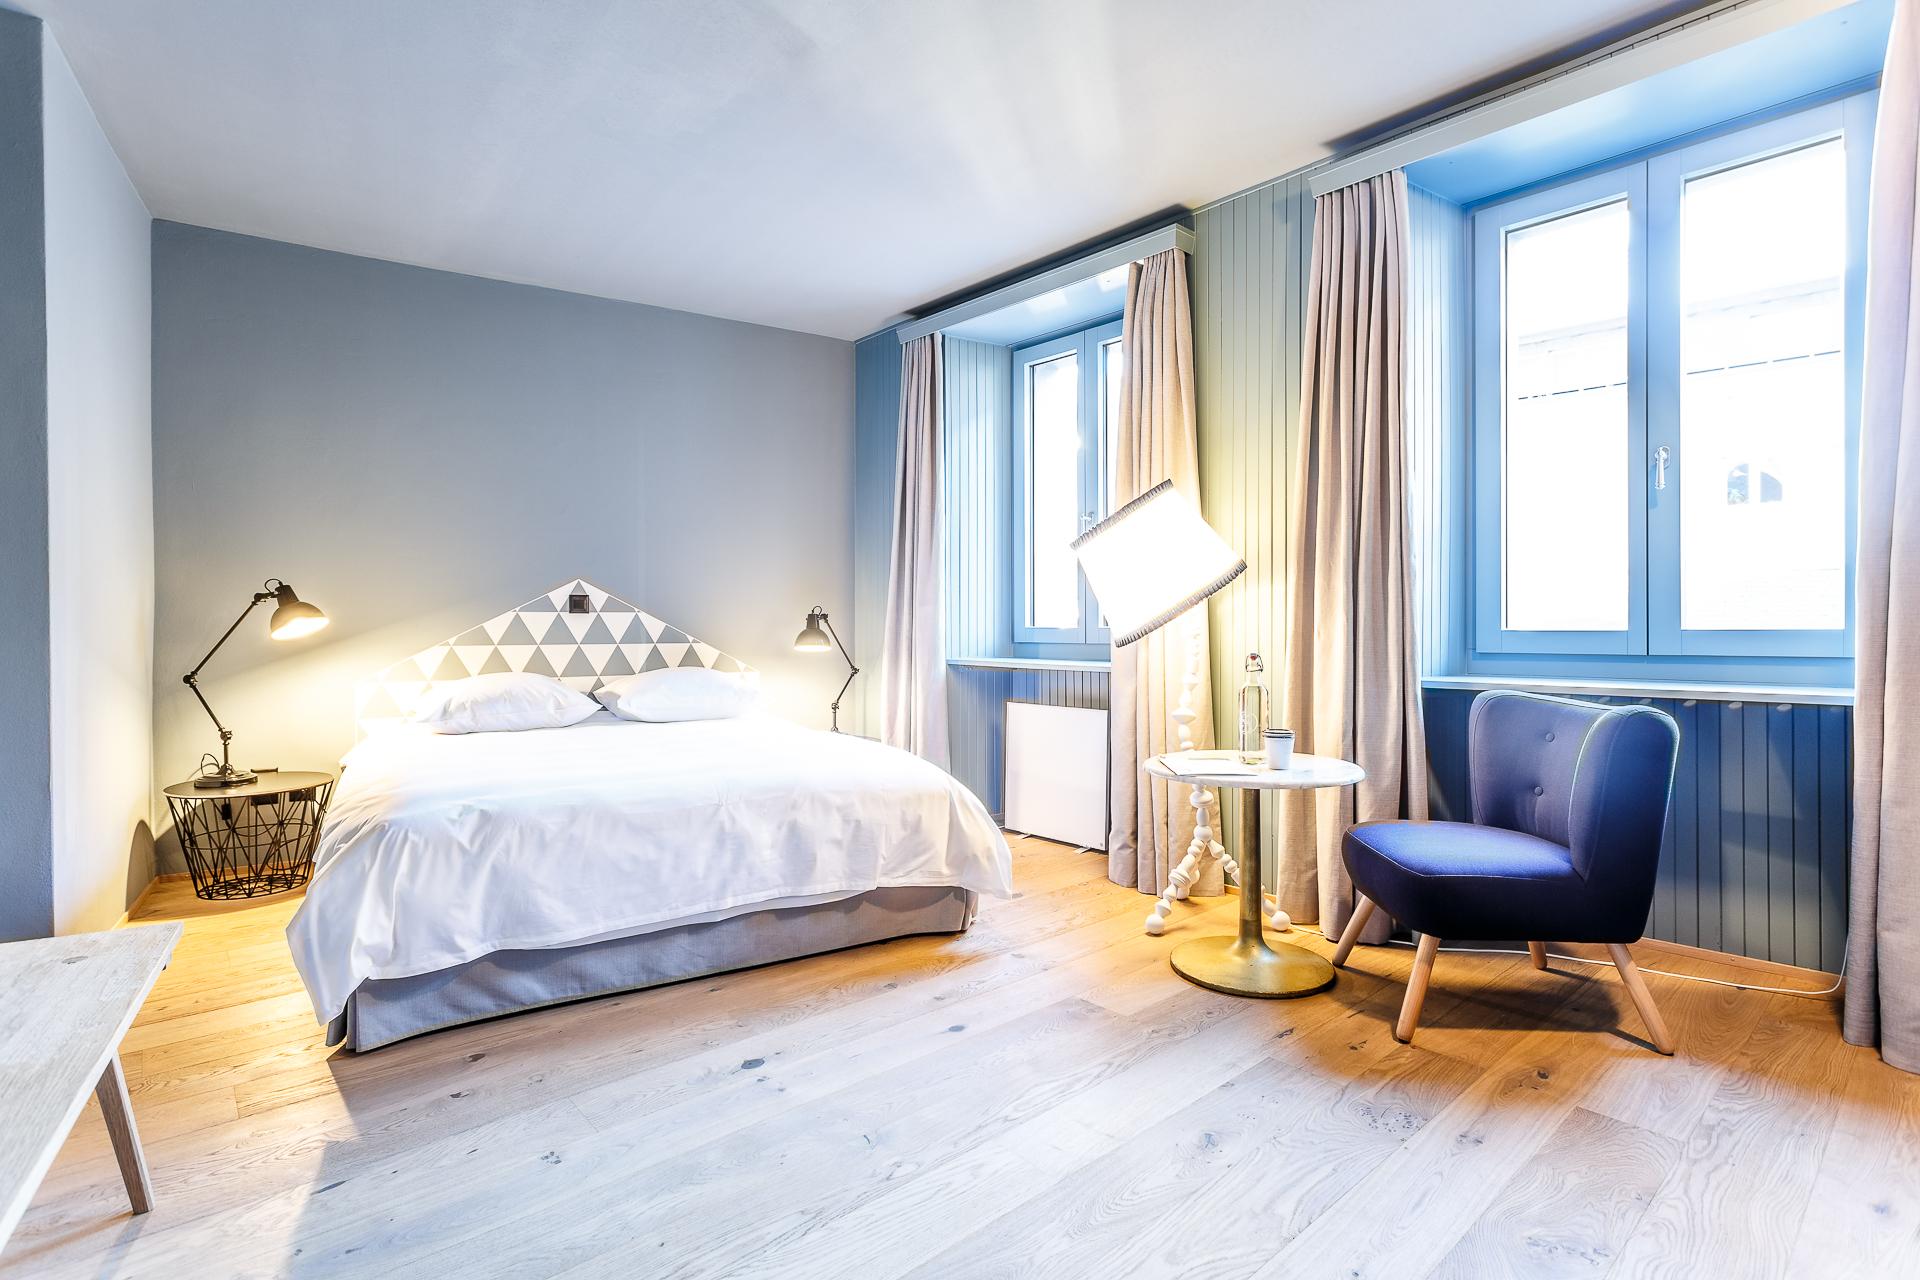 Zimmer im Hotel de Londres in Brig